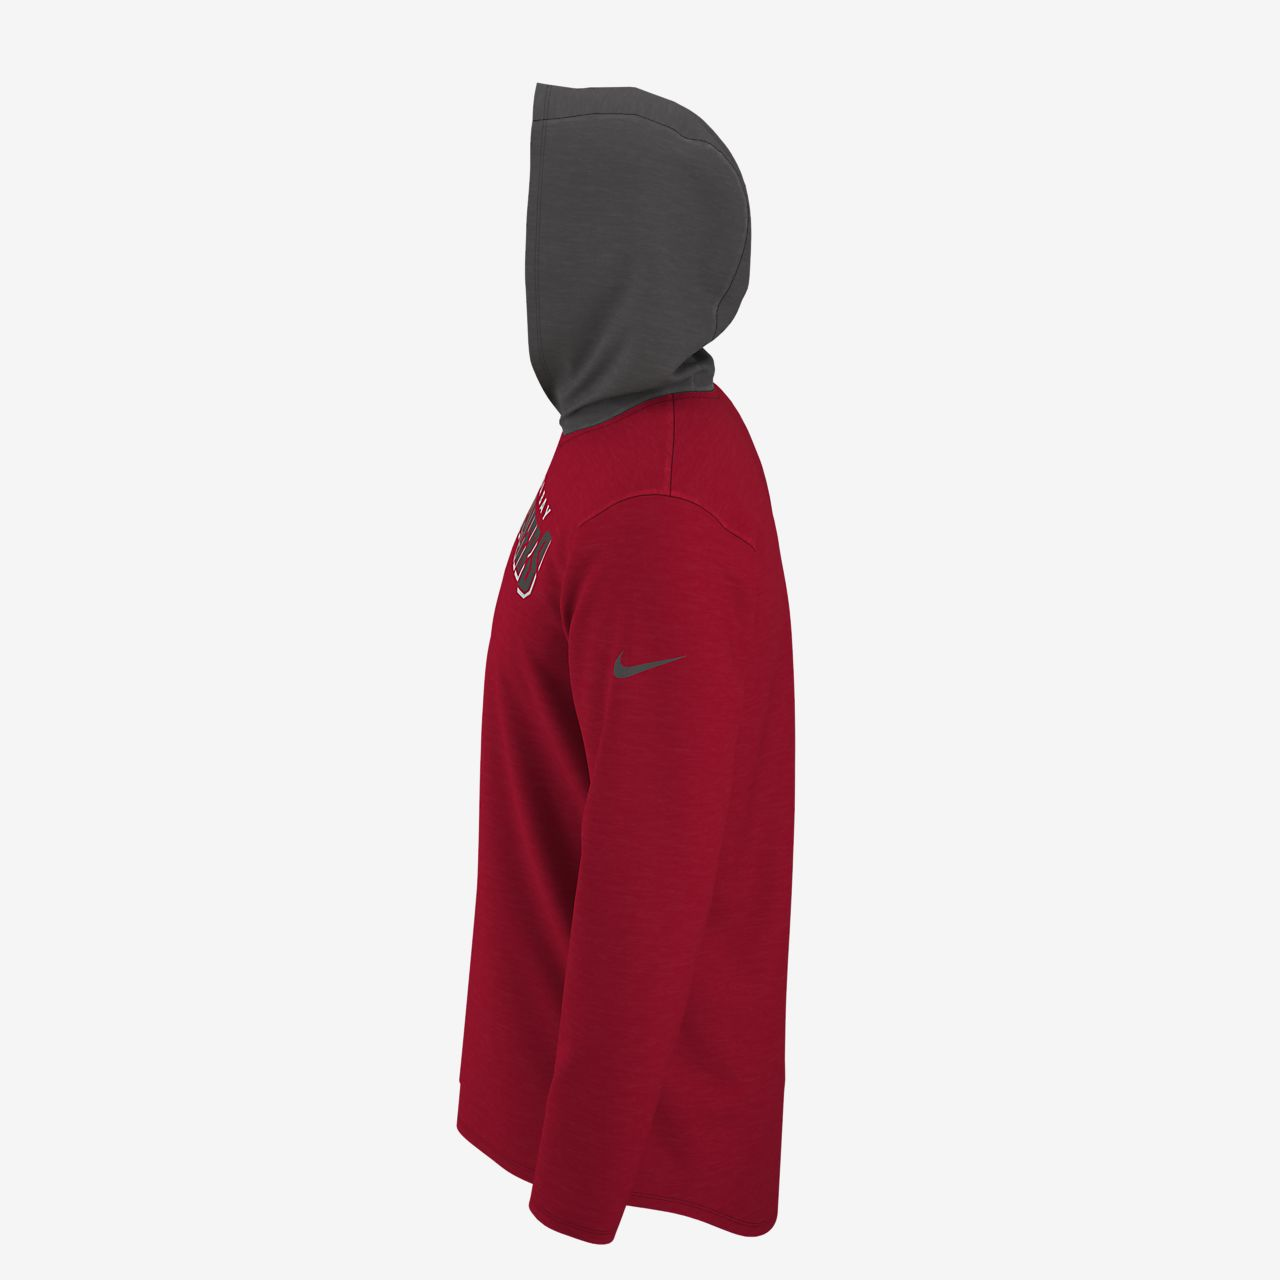 discount on wholesale performance sportswear Nike Dri-FIT (NFL Buccaneers) Men's Long-Sleeve Hooded Top